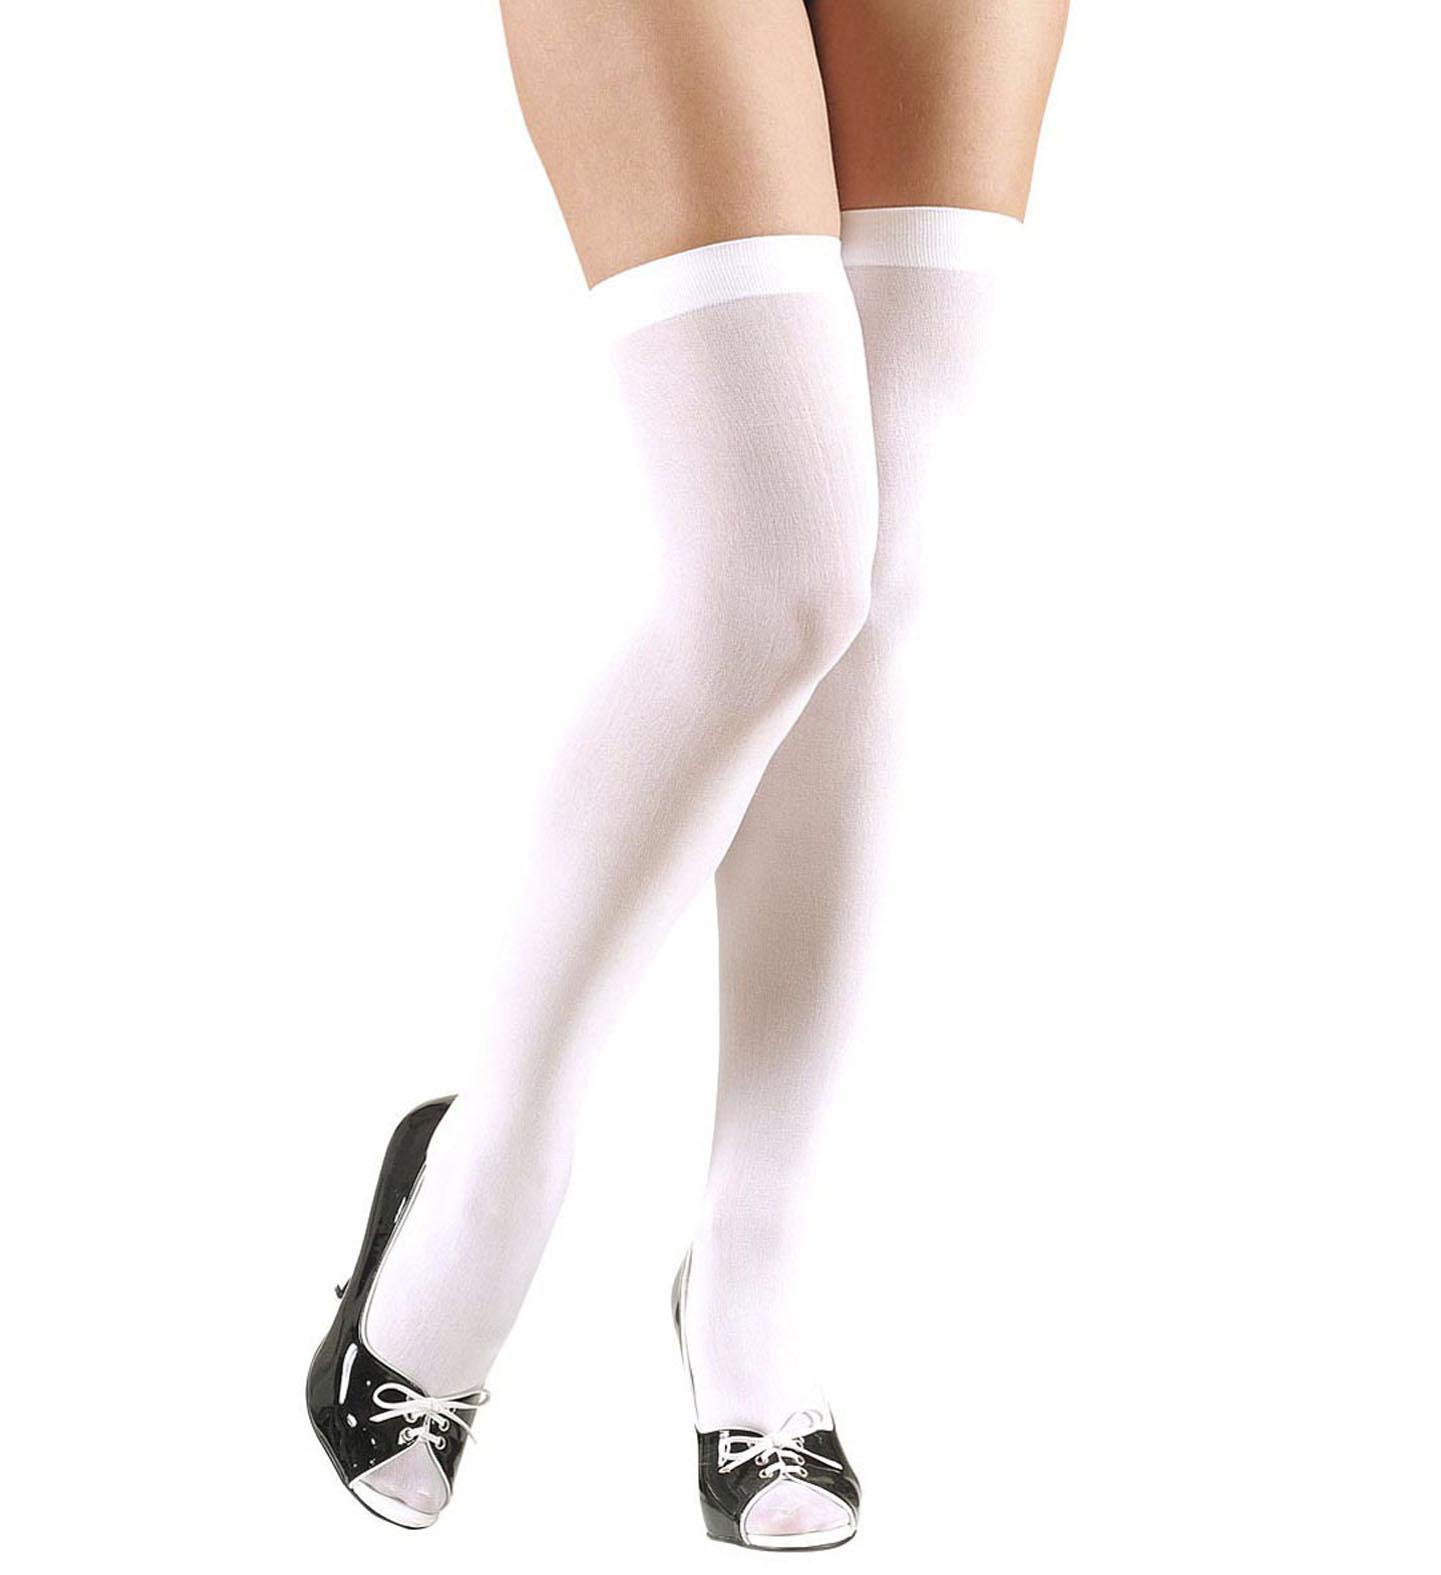 Over The Knee Socks 70 Den Stockings Tights Pantyhose Lingerie Fancy Dress